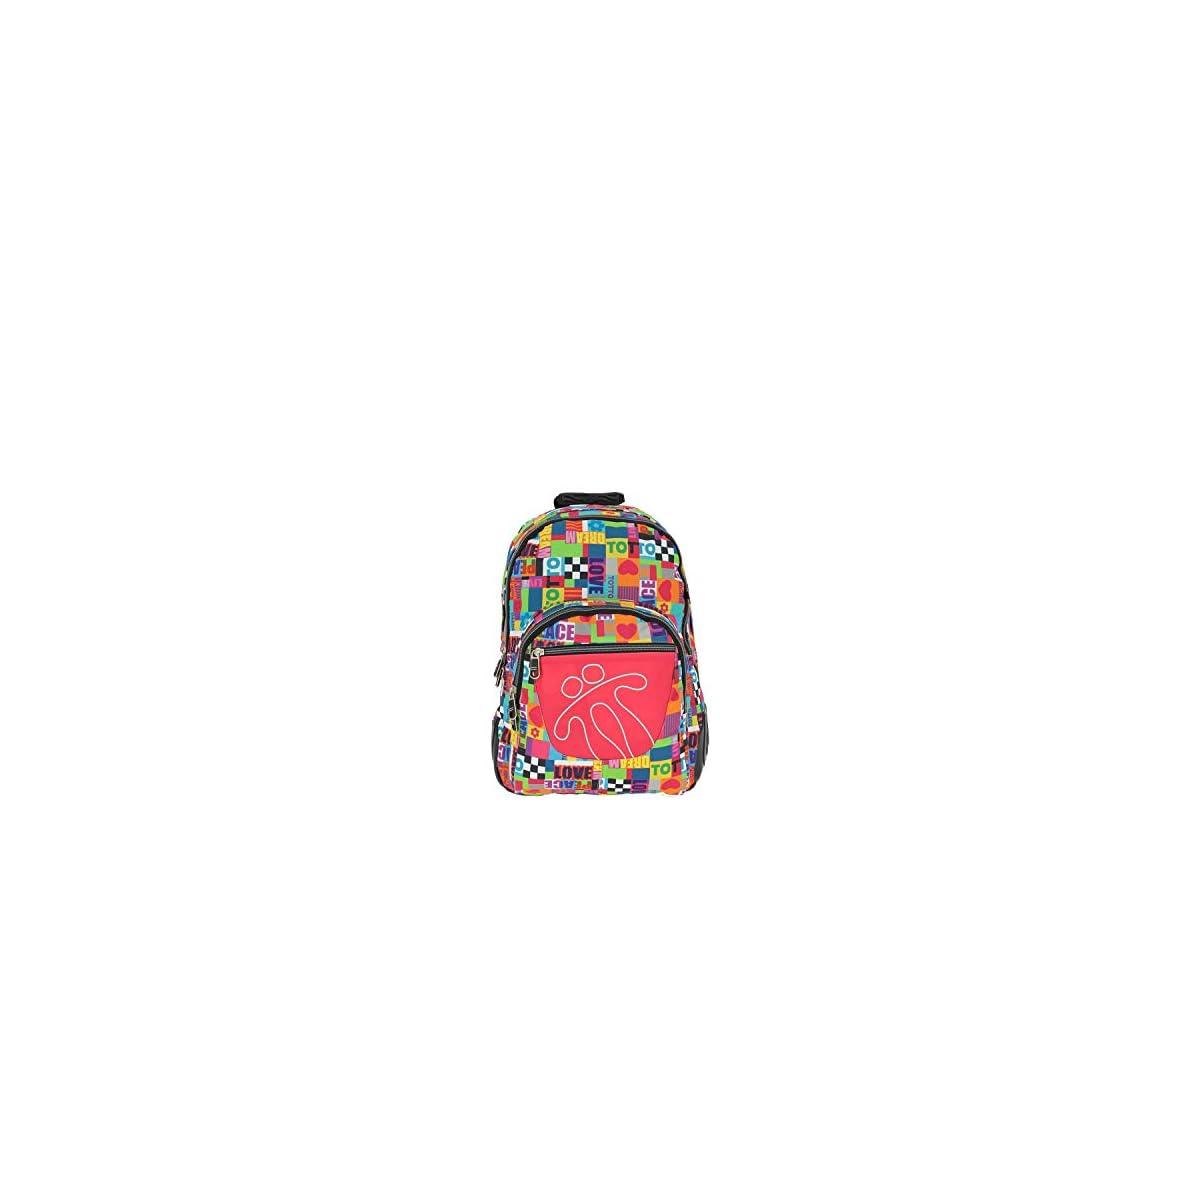 41LBlkFIC9L. SS1200  - TOTTO MA04ECO002-1610N-9P1 2018 Mochila Infantil, 44 cm, litros